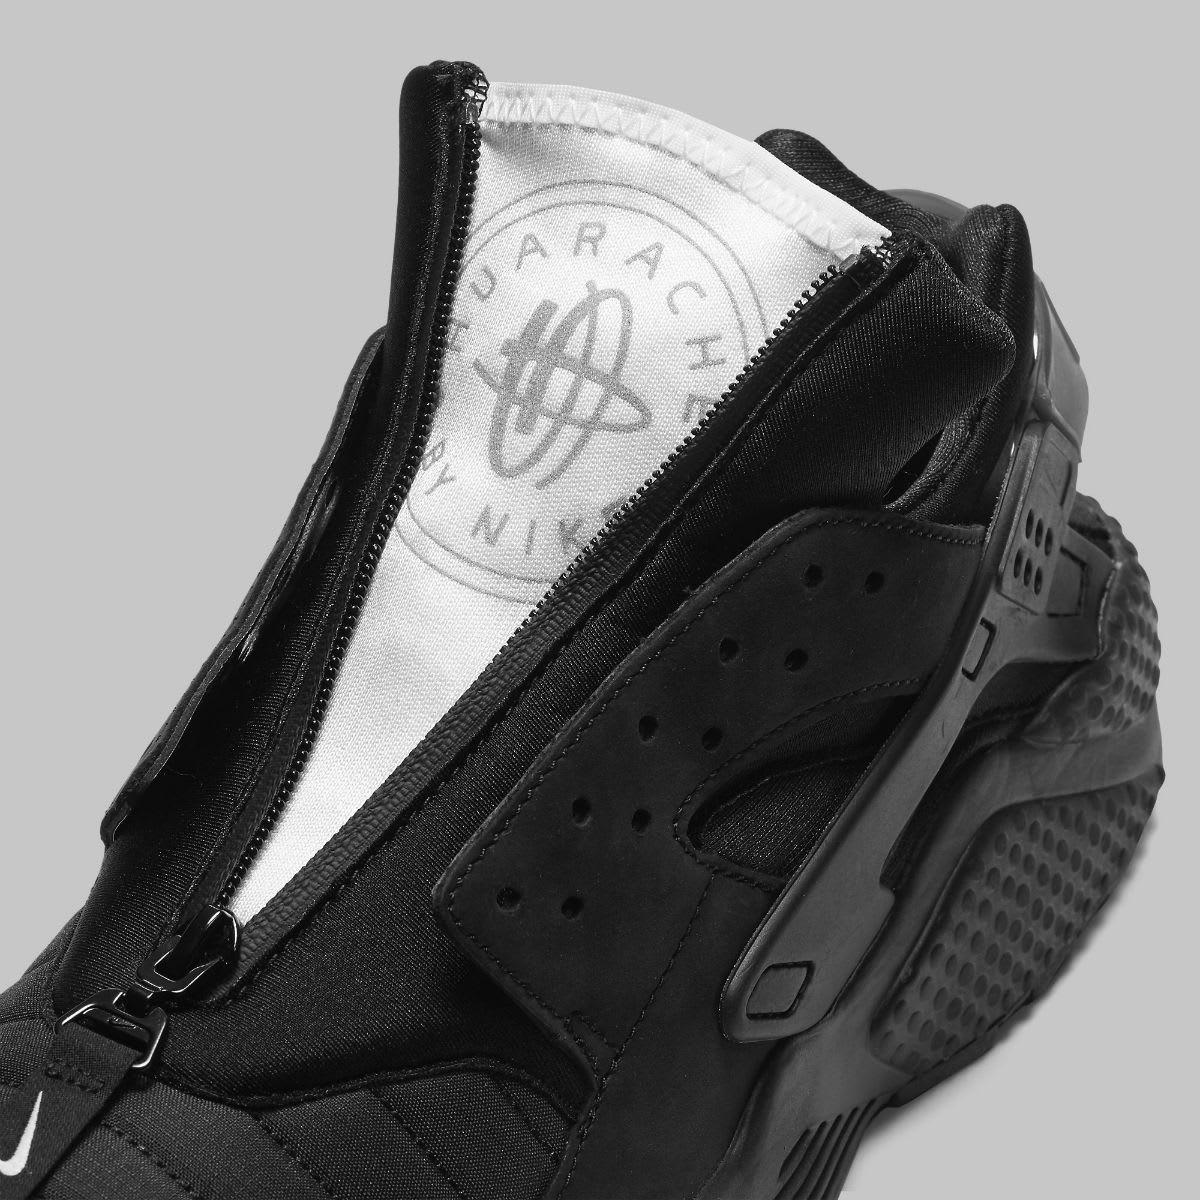 Nike Air Huarache Run NYC Triple Black Release Date AJ5578-001 Tongue